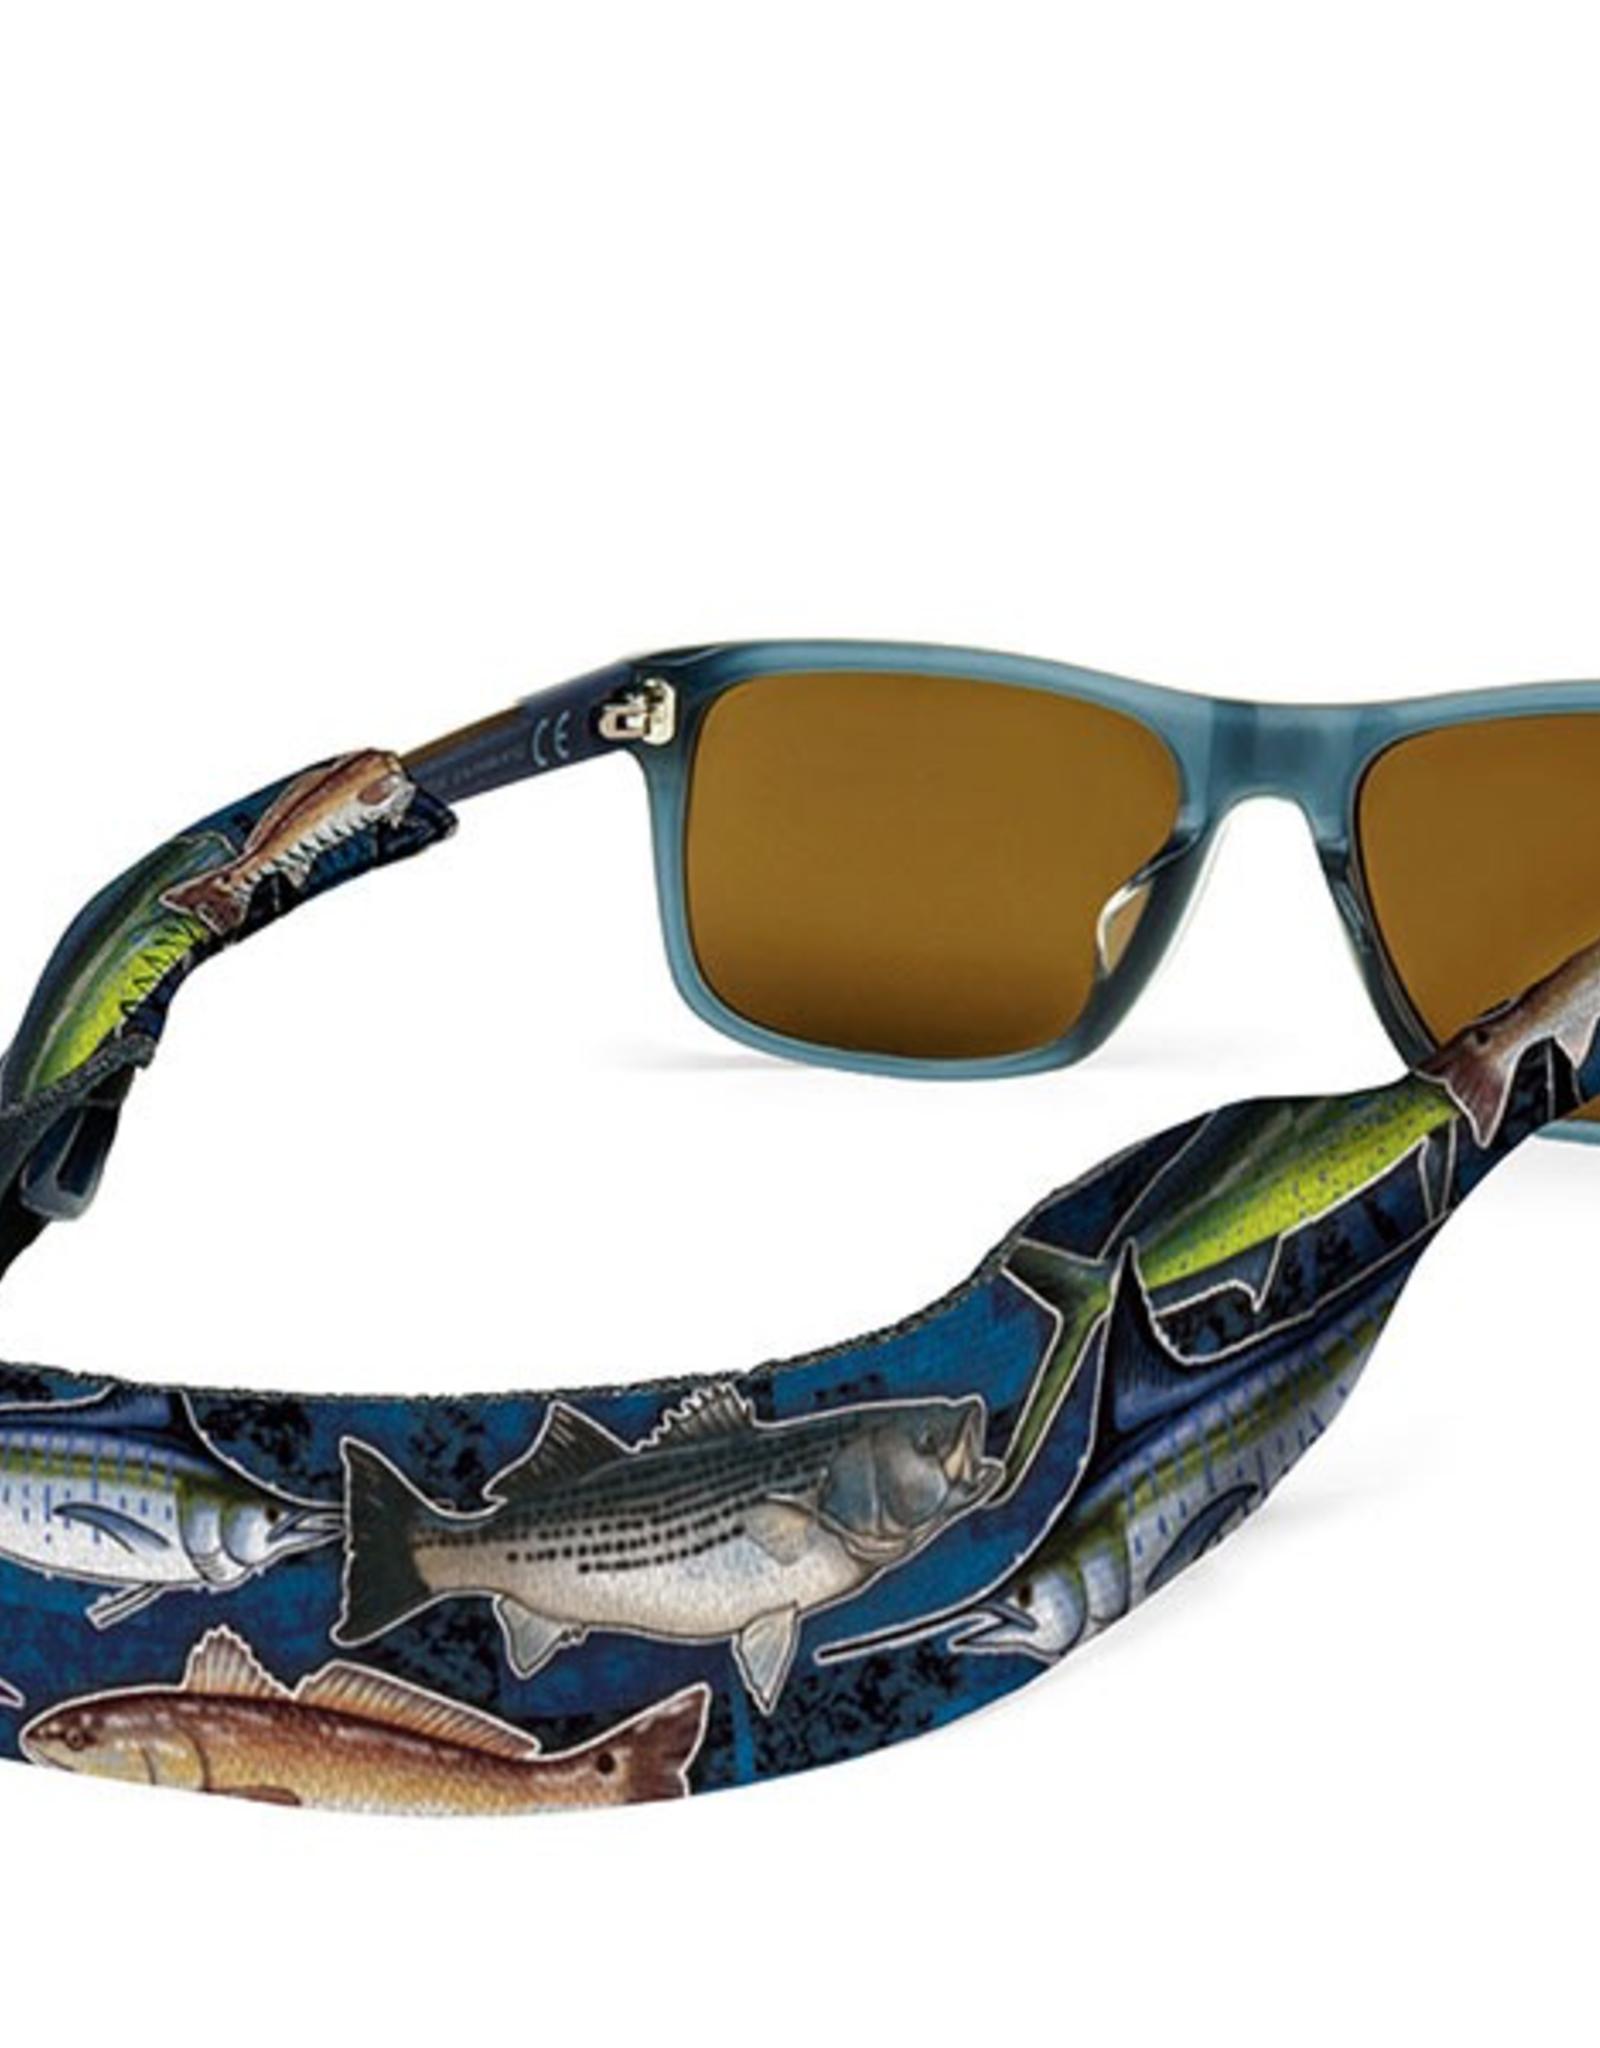 CROAKIES CROAKIES FISHING PRINT OFFSHORE / XL